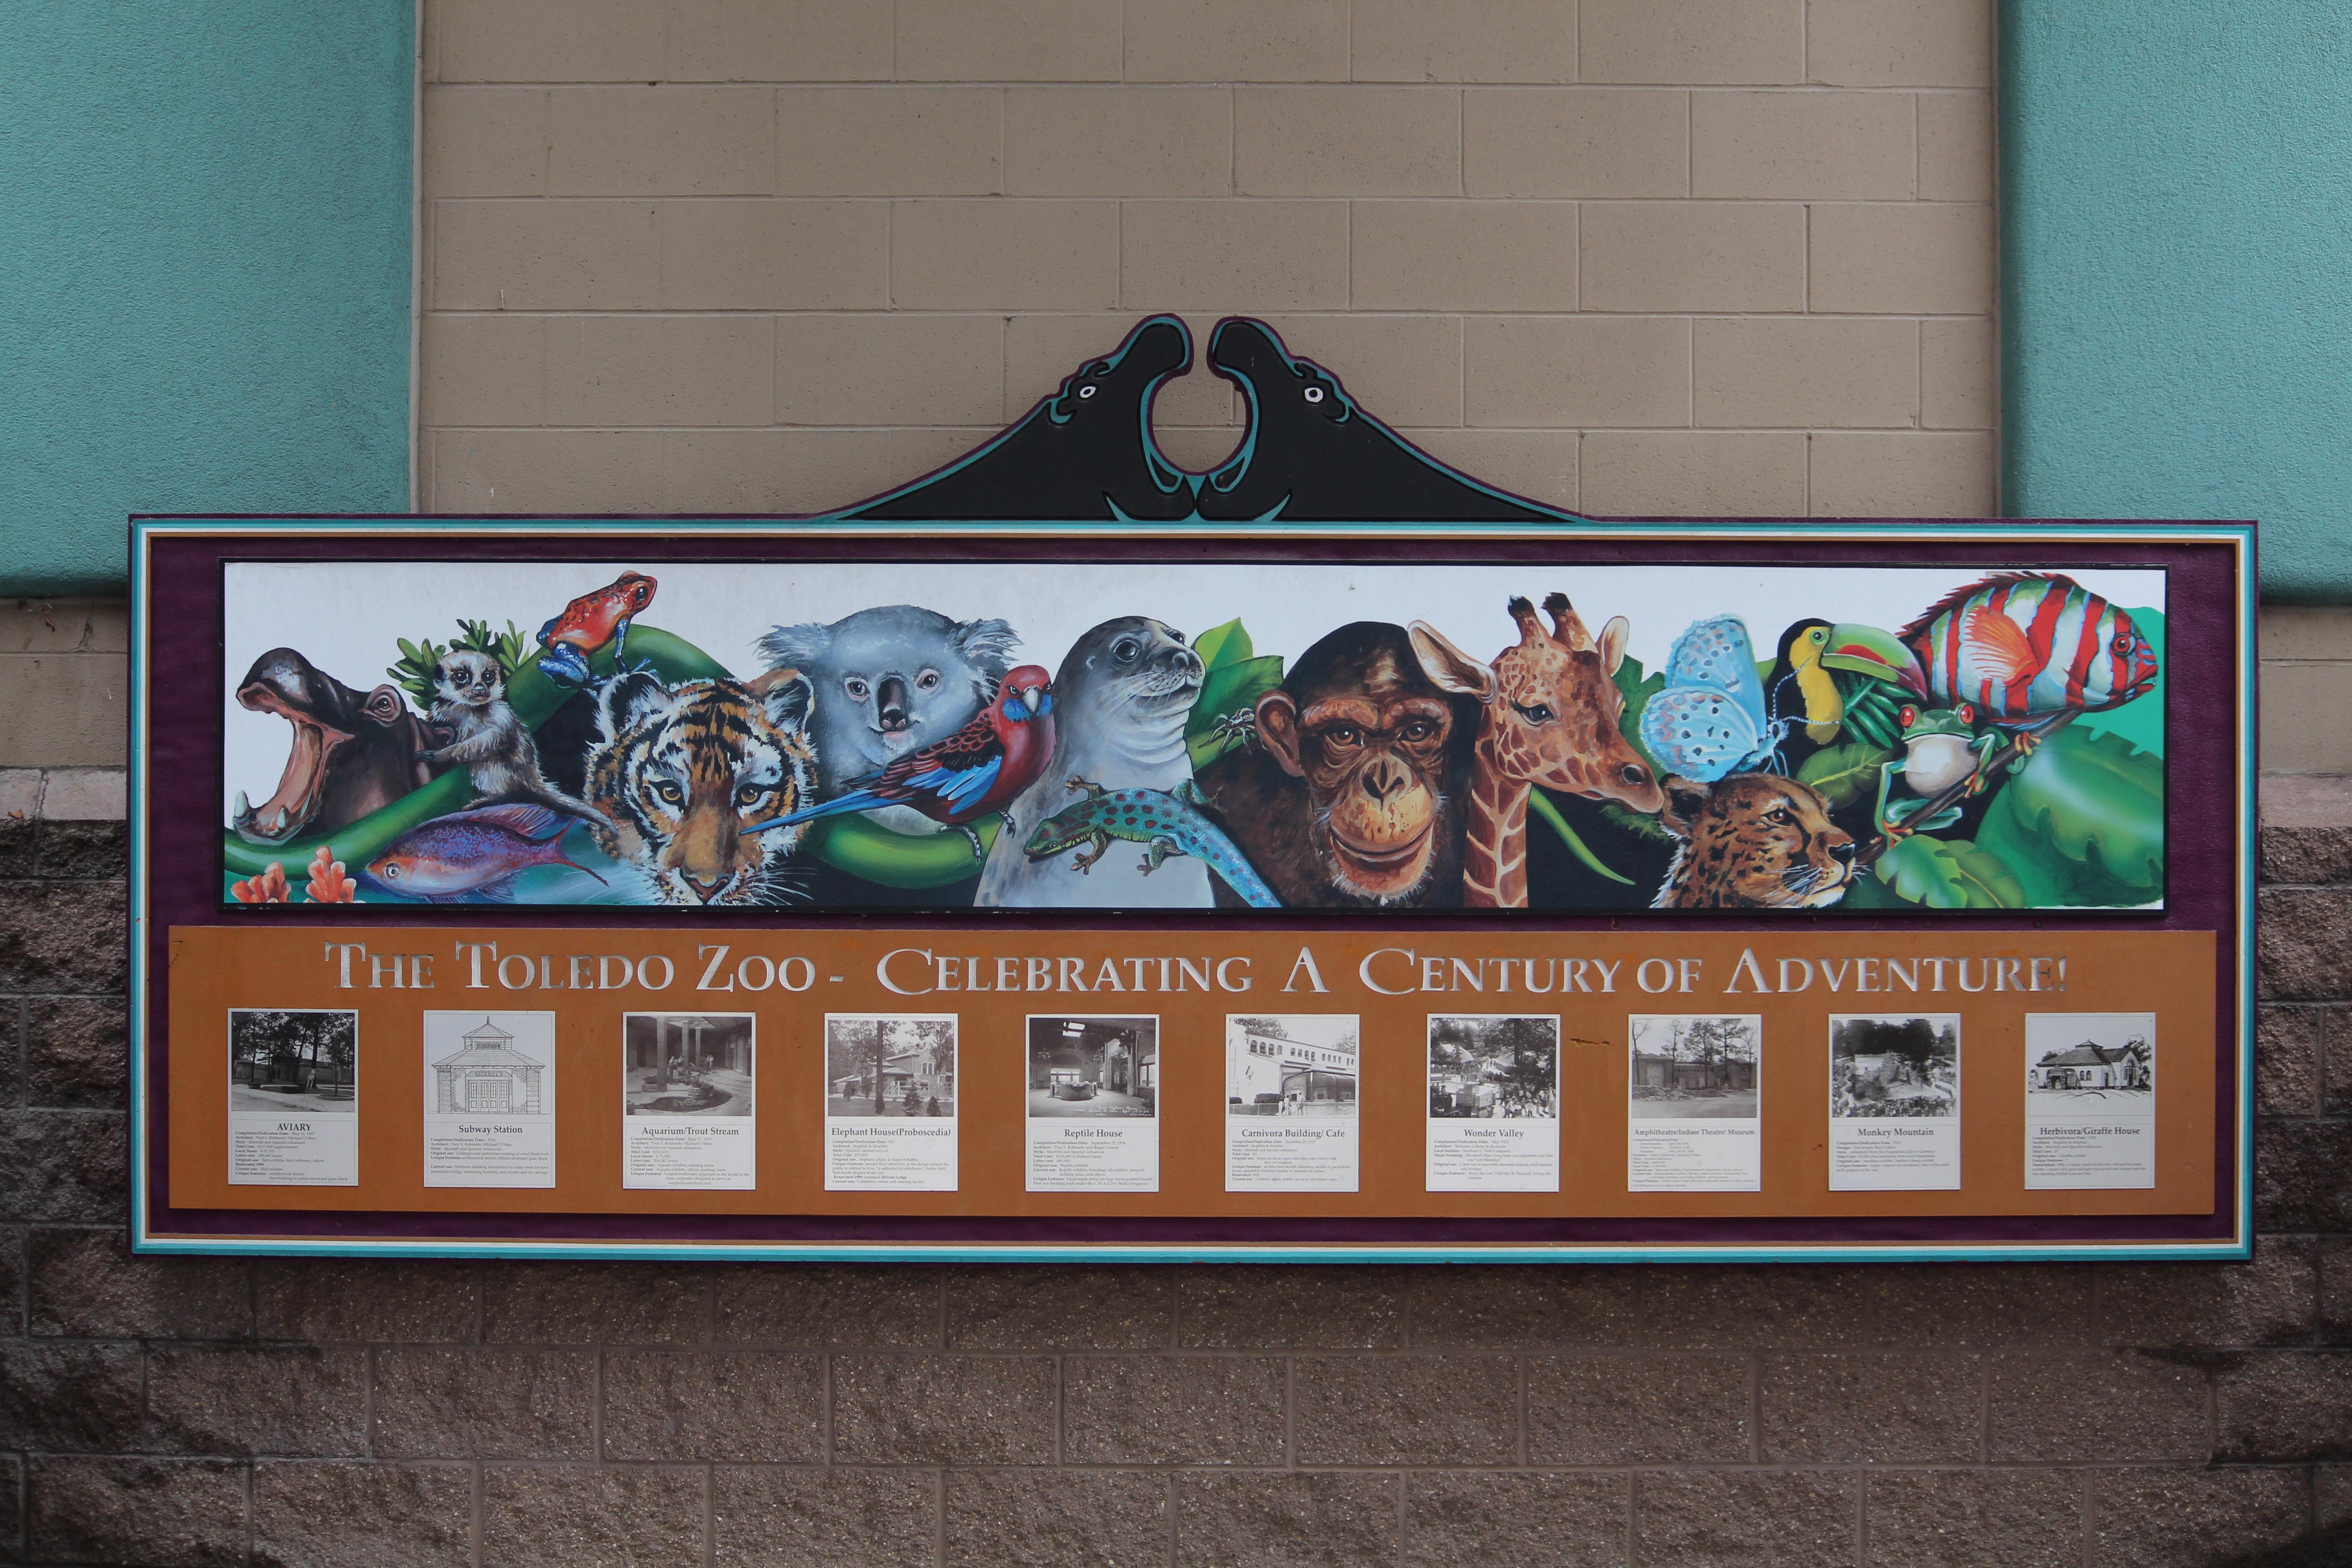 Toledo Zoo - Wikipedia